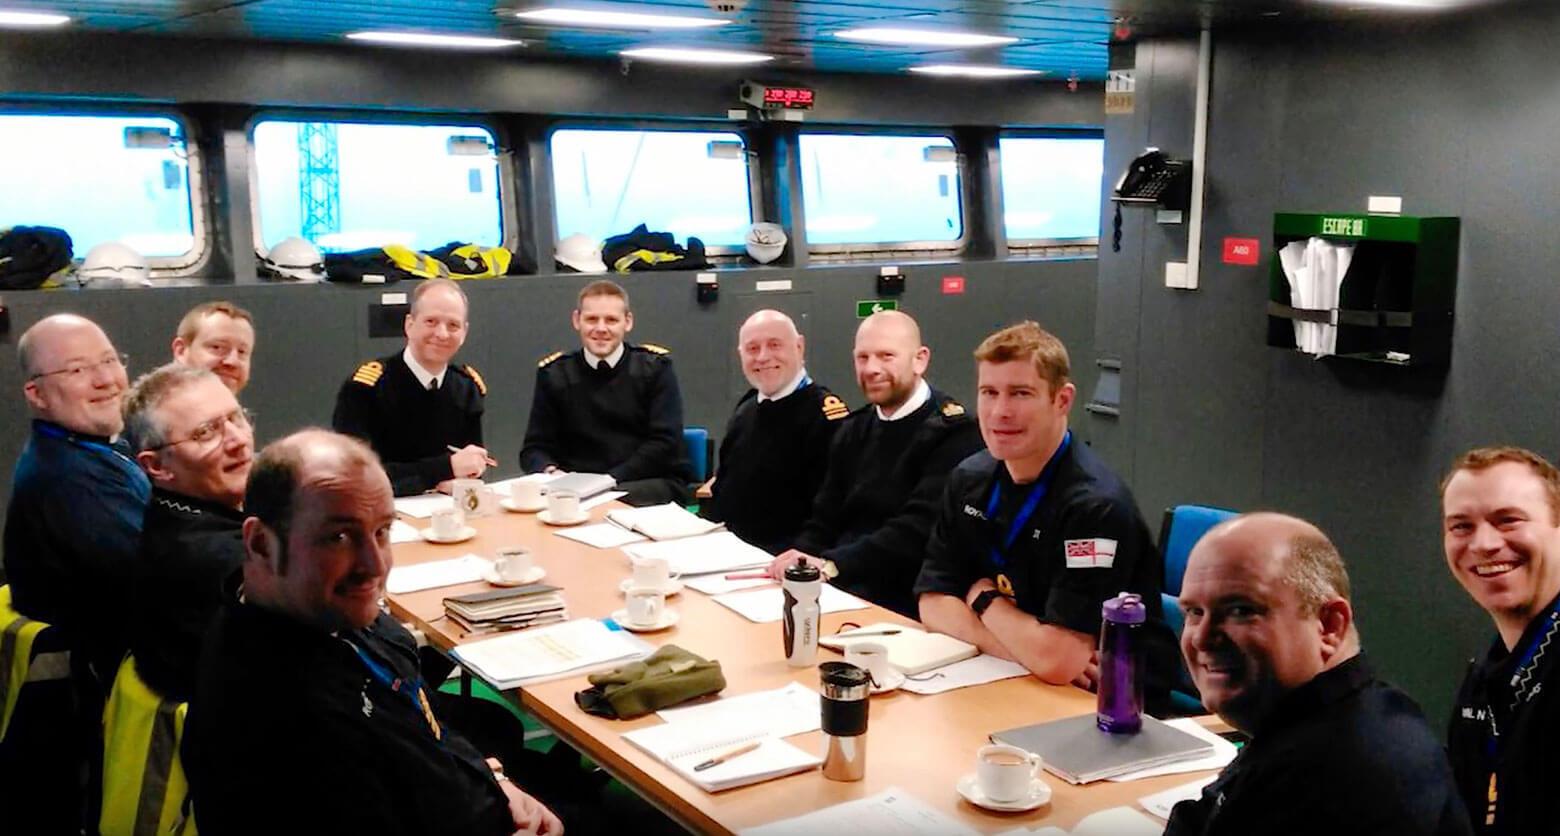 Heads of department (HODs) meeting